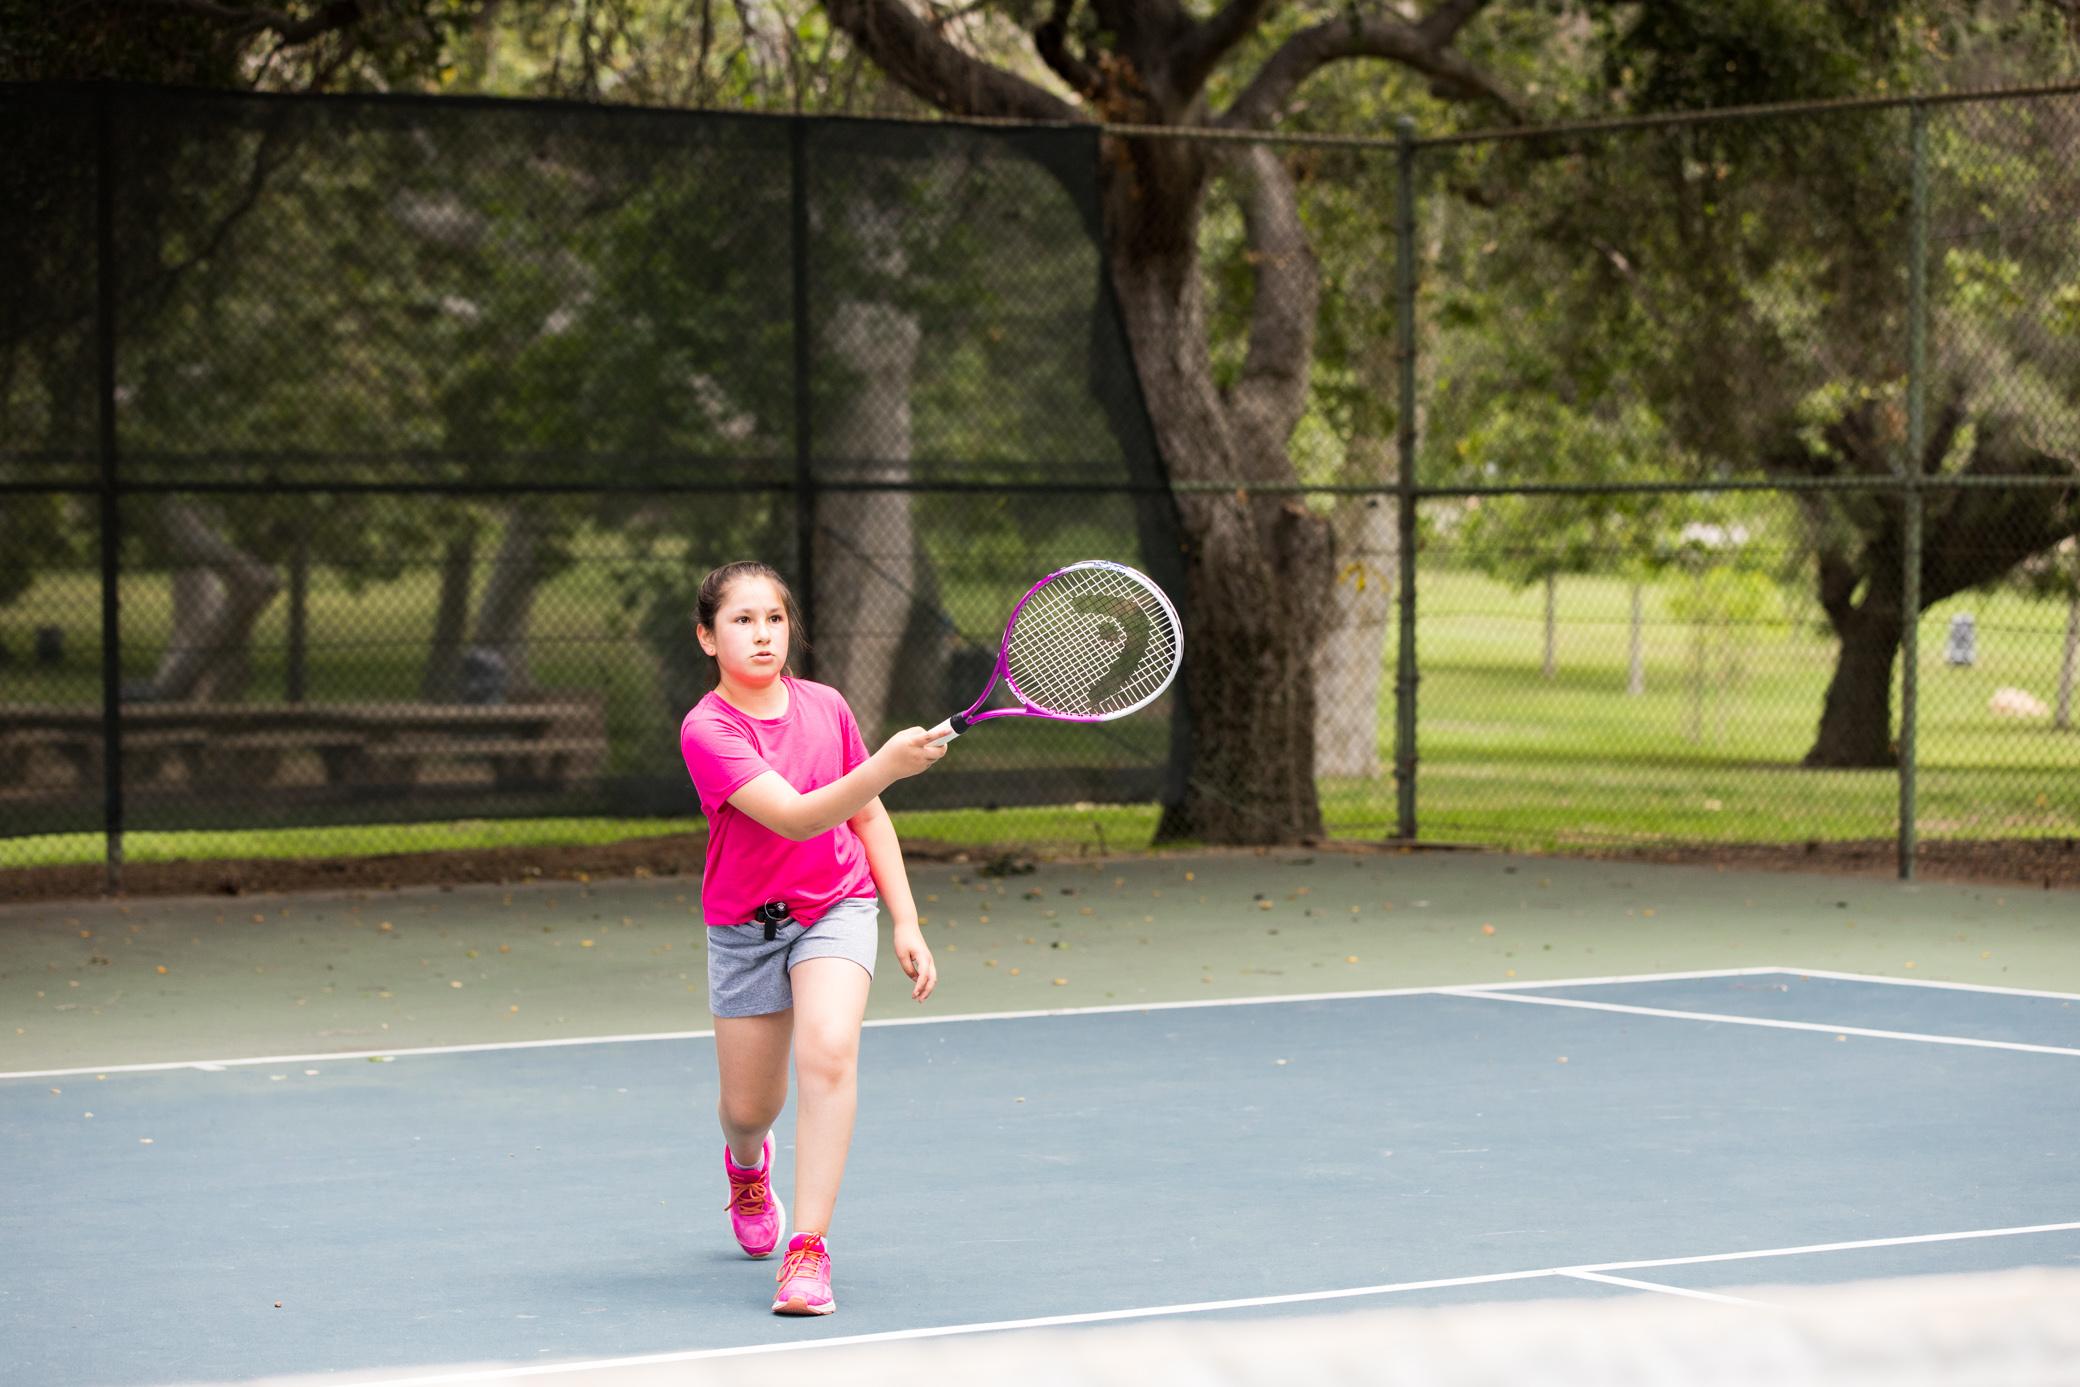 Medtronic-LA-Tennis-308.jpg